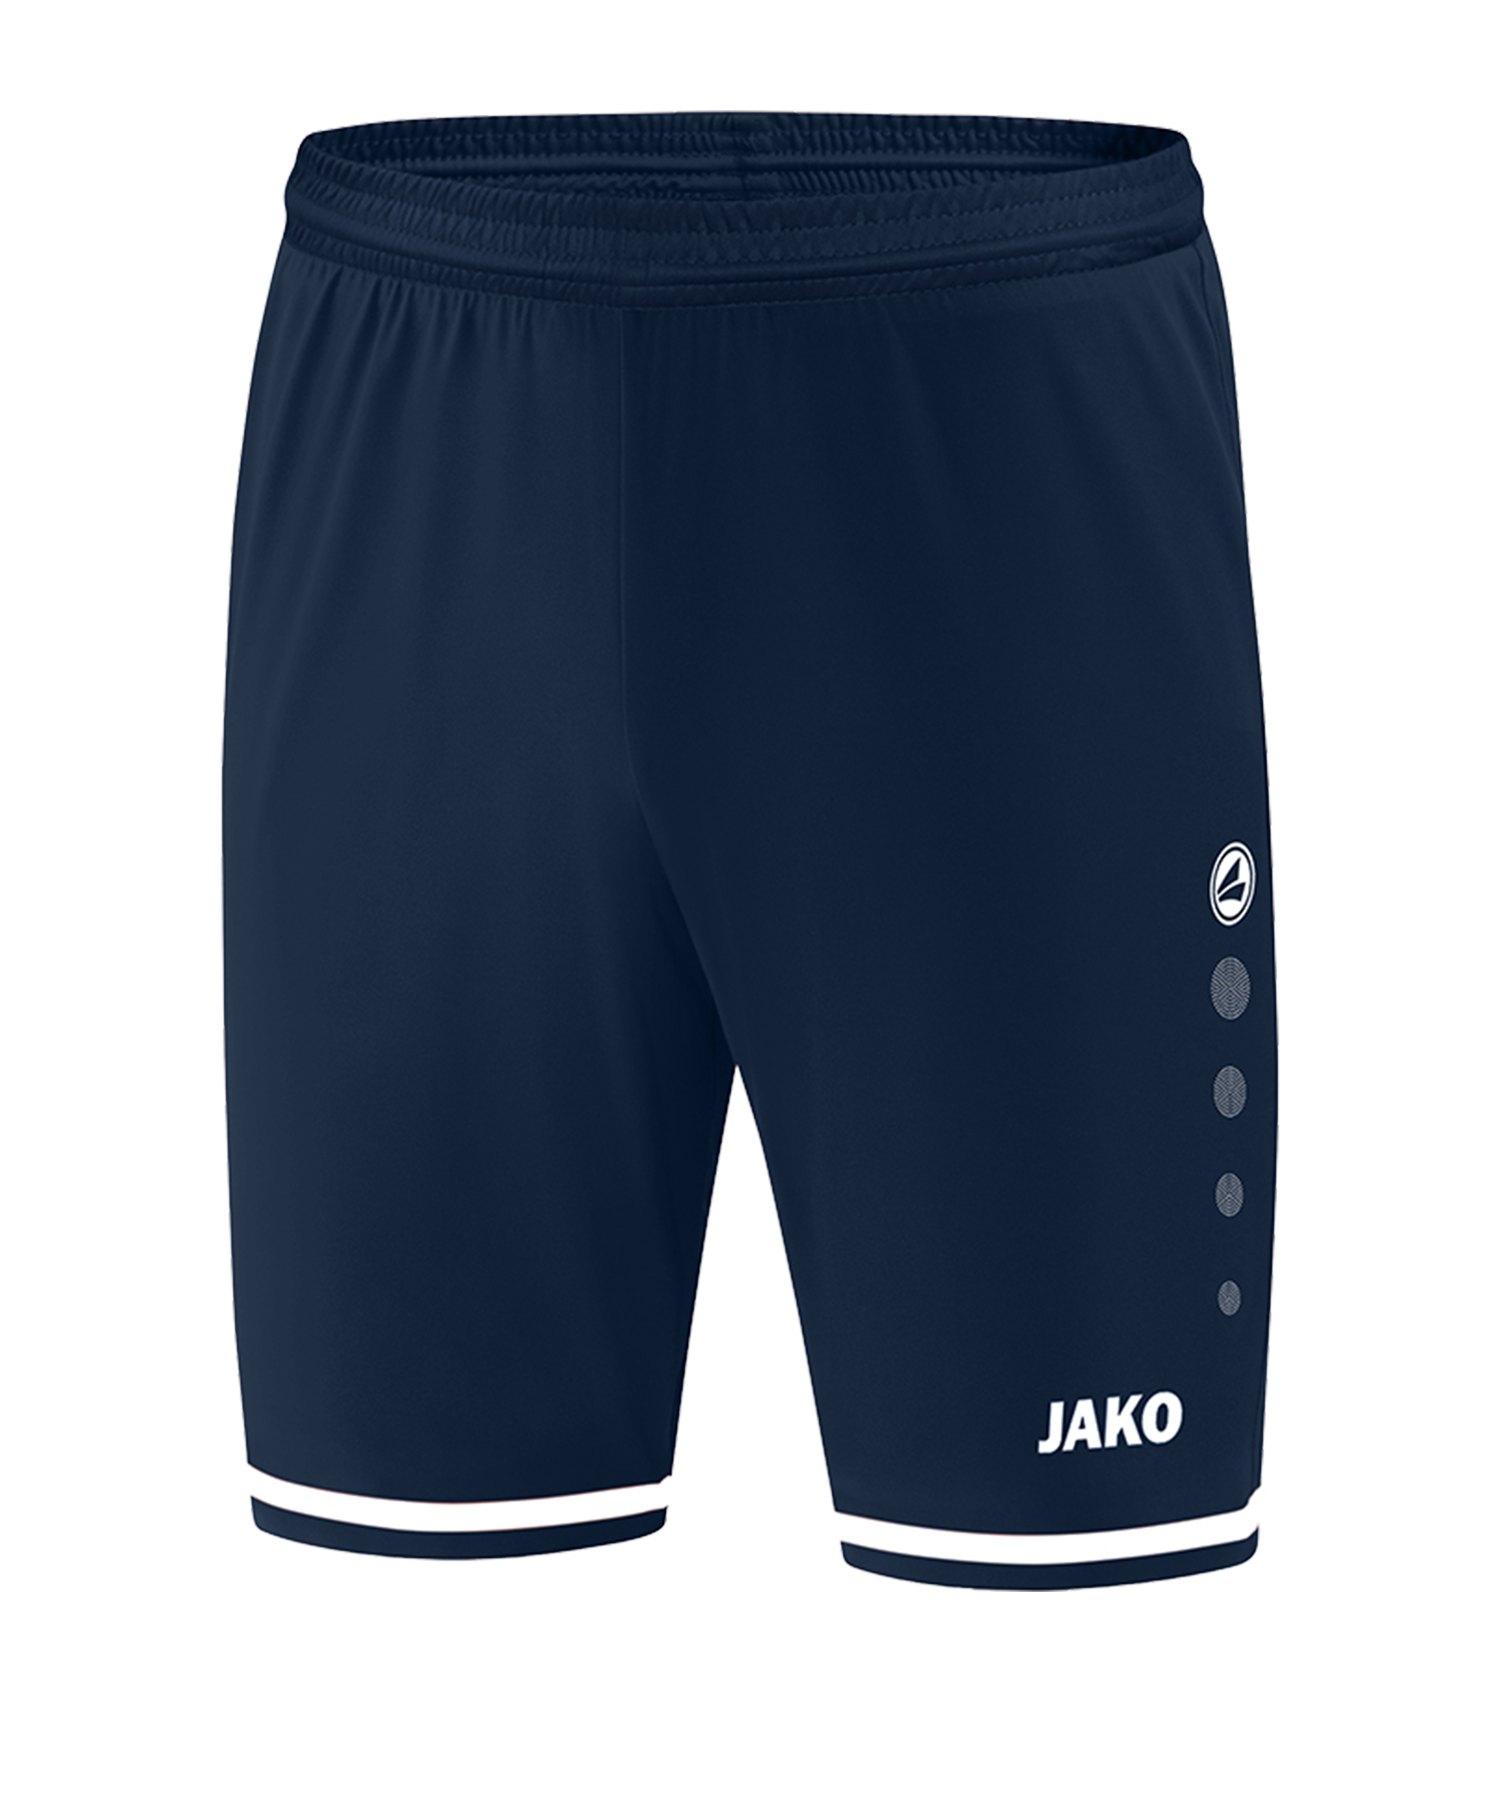 Jako Striker 2.0 Short Hose kurz Blau Weiss F99 - Blau